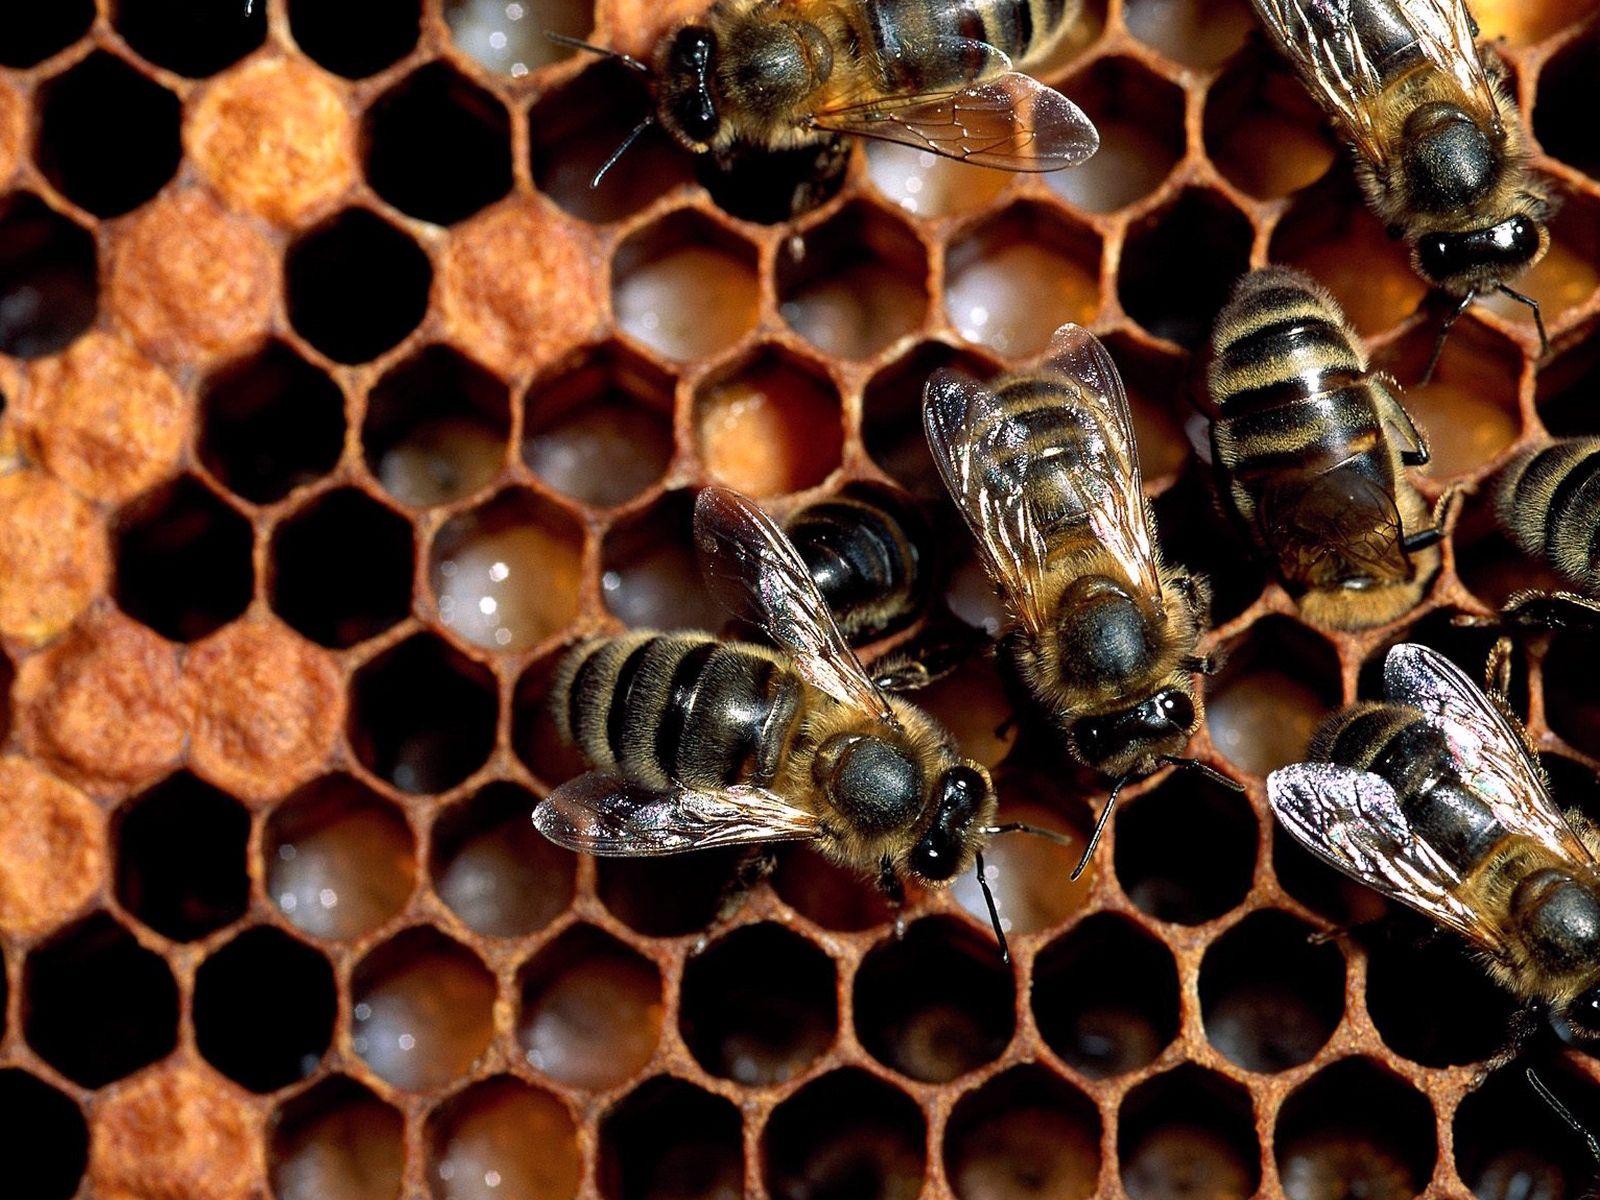 86223 Hintergrundbild herunterladen Bienen, Makro, Herde, Honig, Bienenwabe, Waben - Bildschirmschoner und Bilder kostenlos